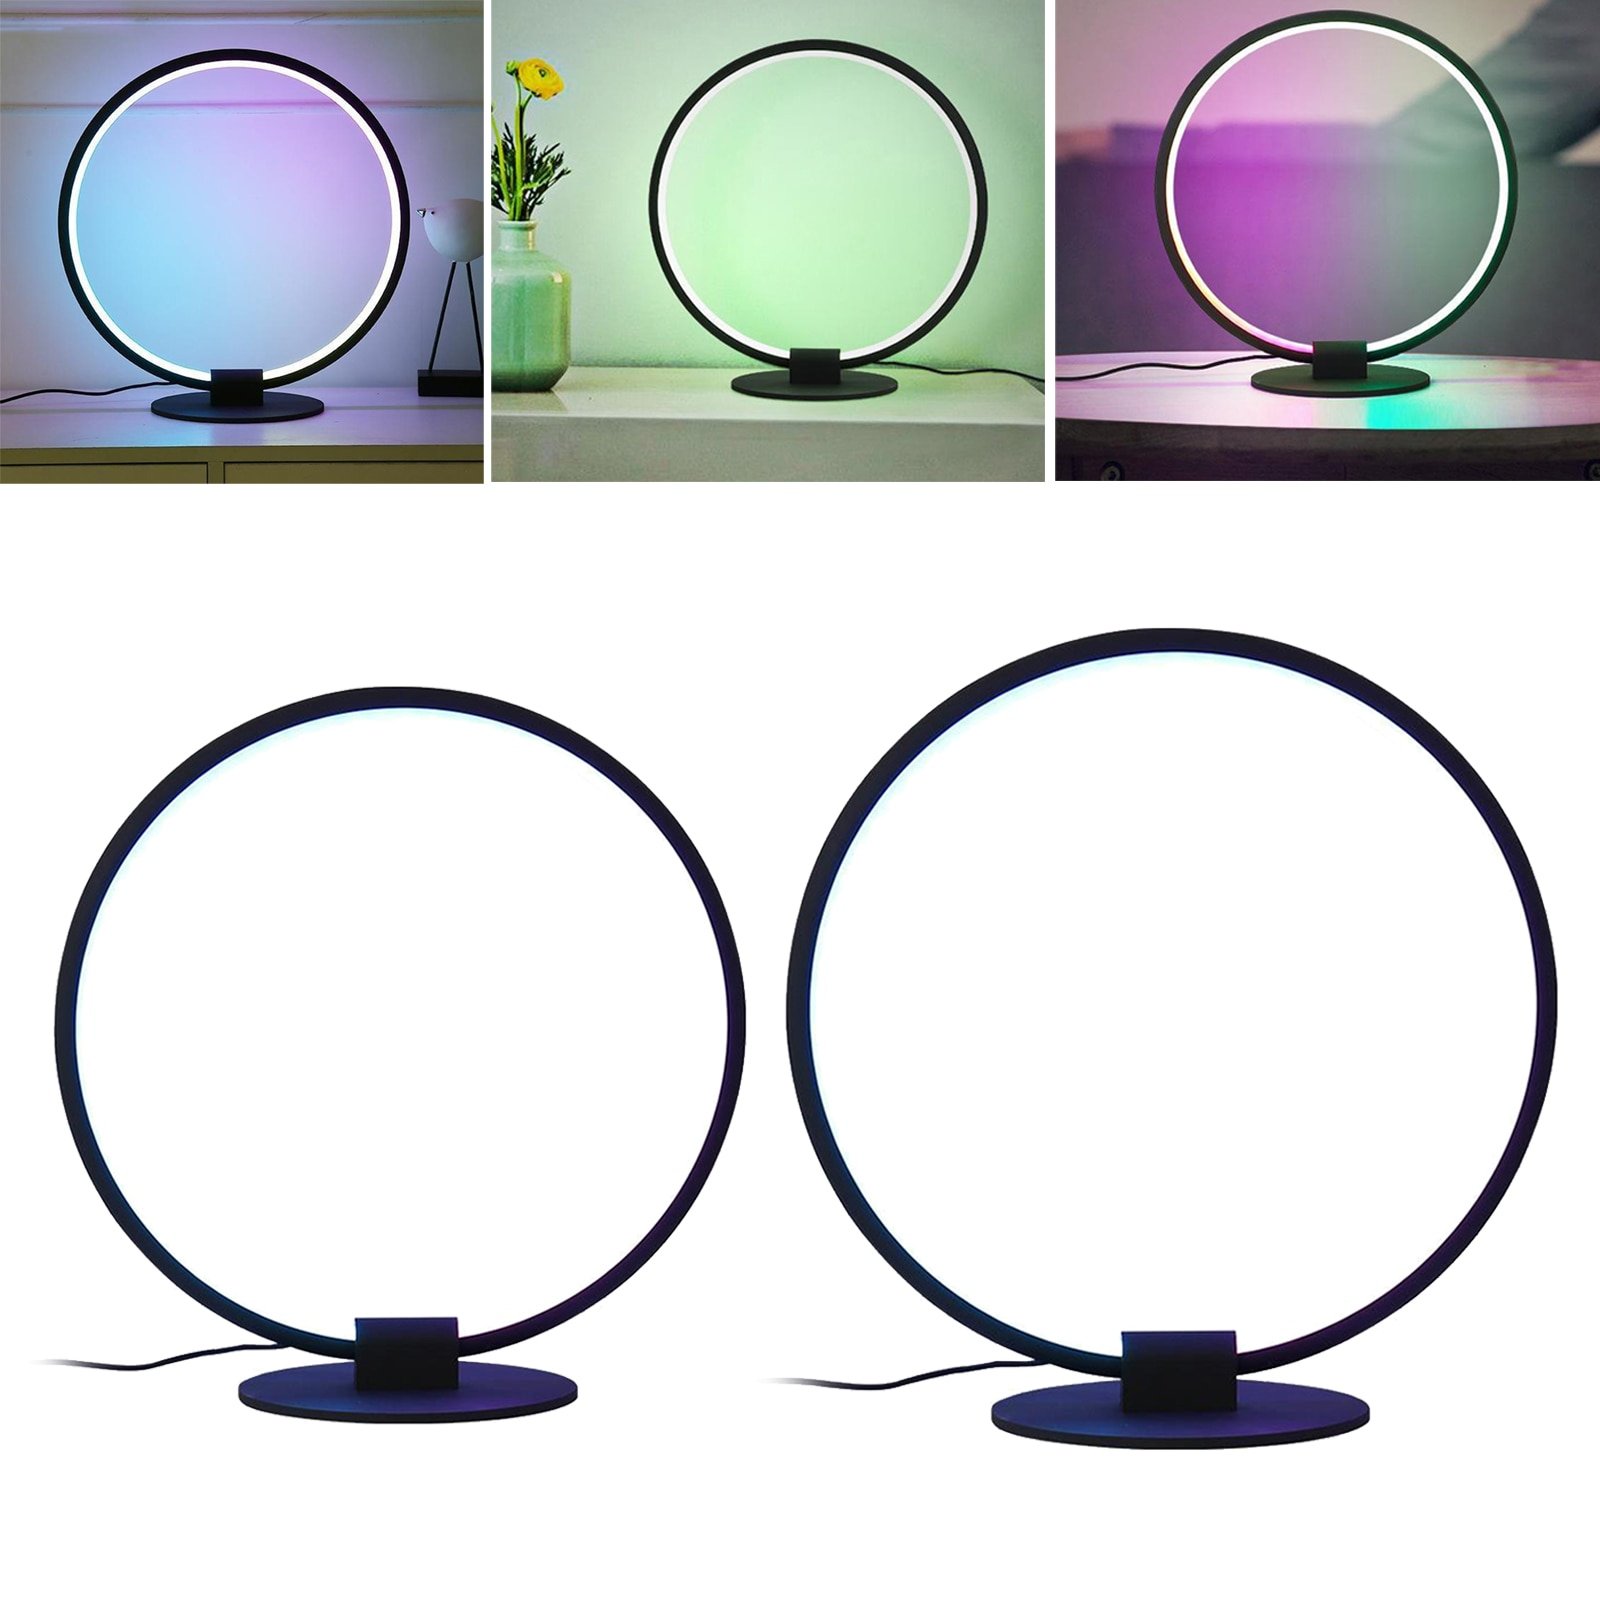 Modern LED Desk Lamp Nightlight RBG Color Changing Office Lighting Decor